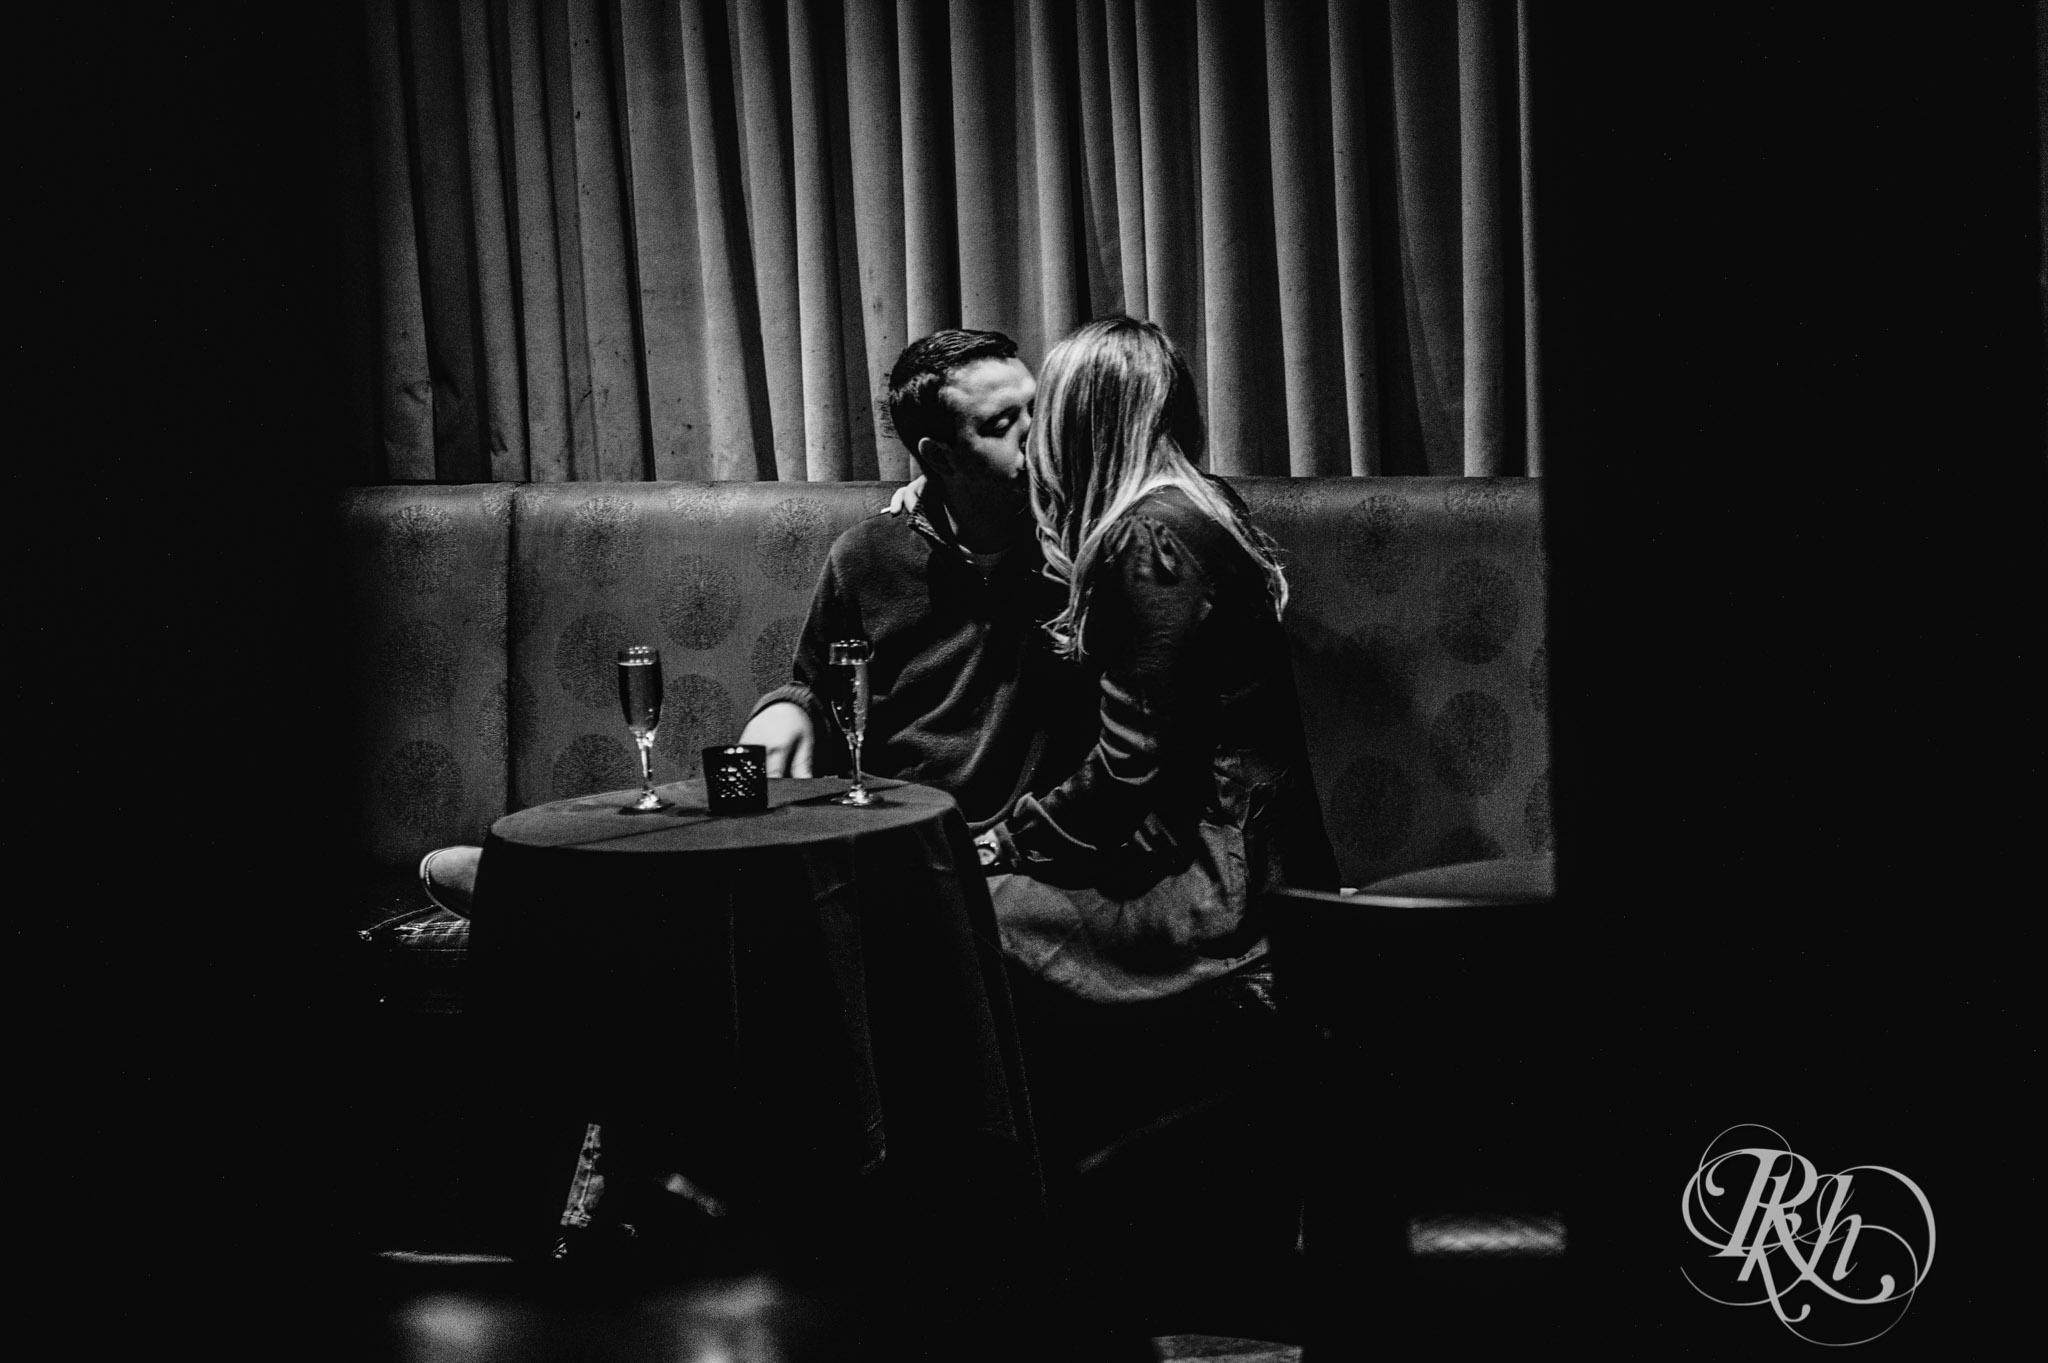 Libby & Ian - Minneapolis Engagement Photography - Honey Lounge - RKH Images (15 of 26).jpg